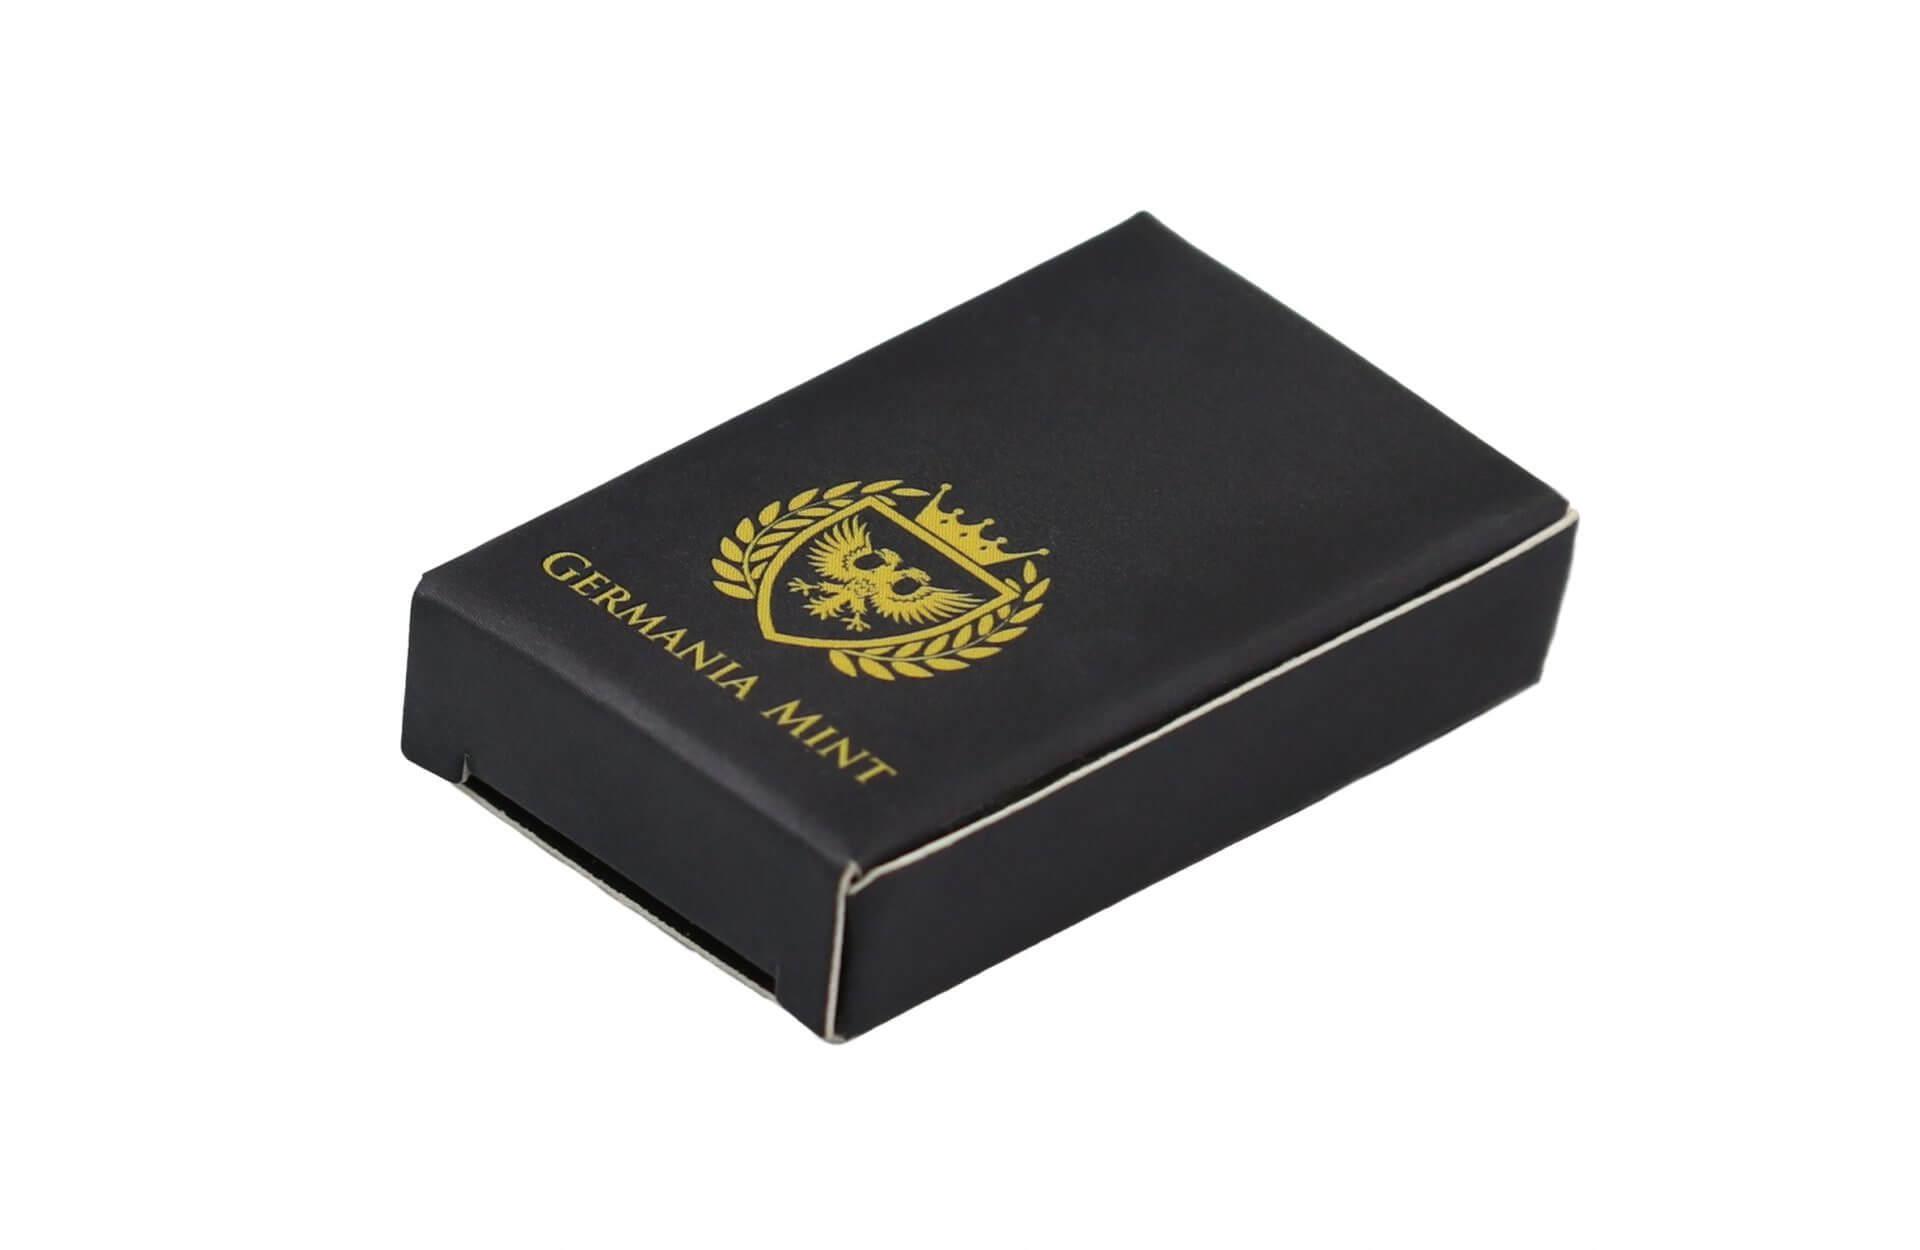 Germania Mint 100g .9999 Silver Cast Bullion Bar 4